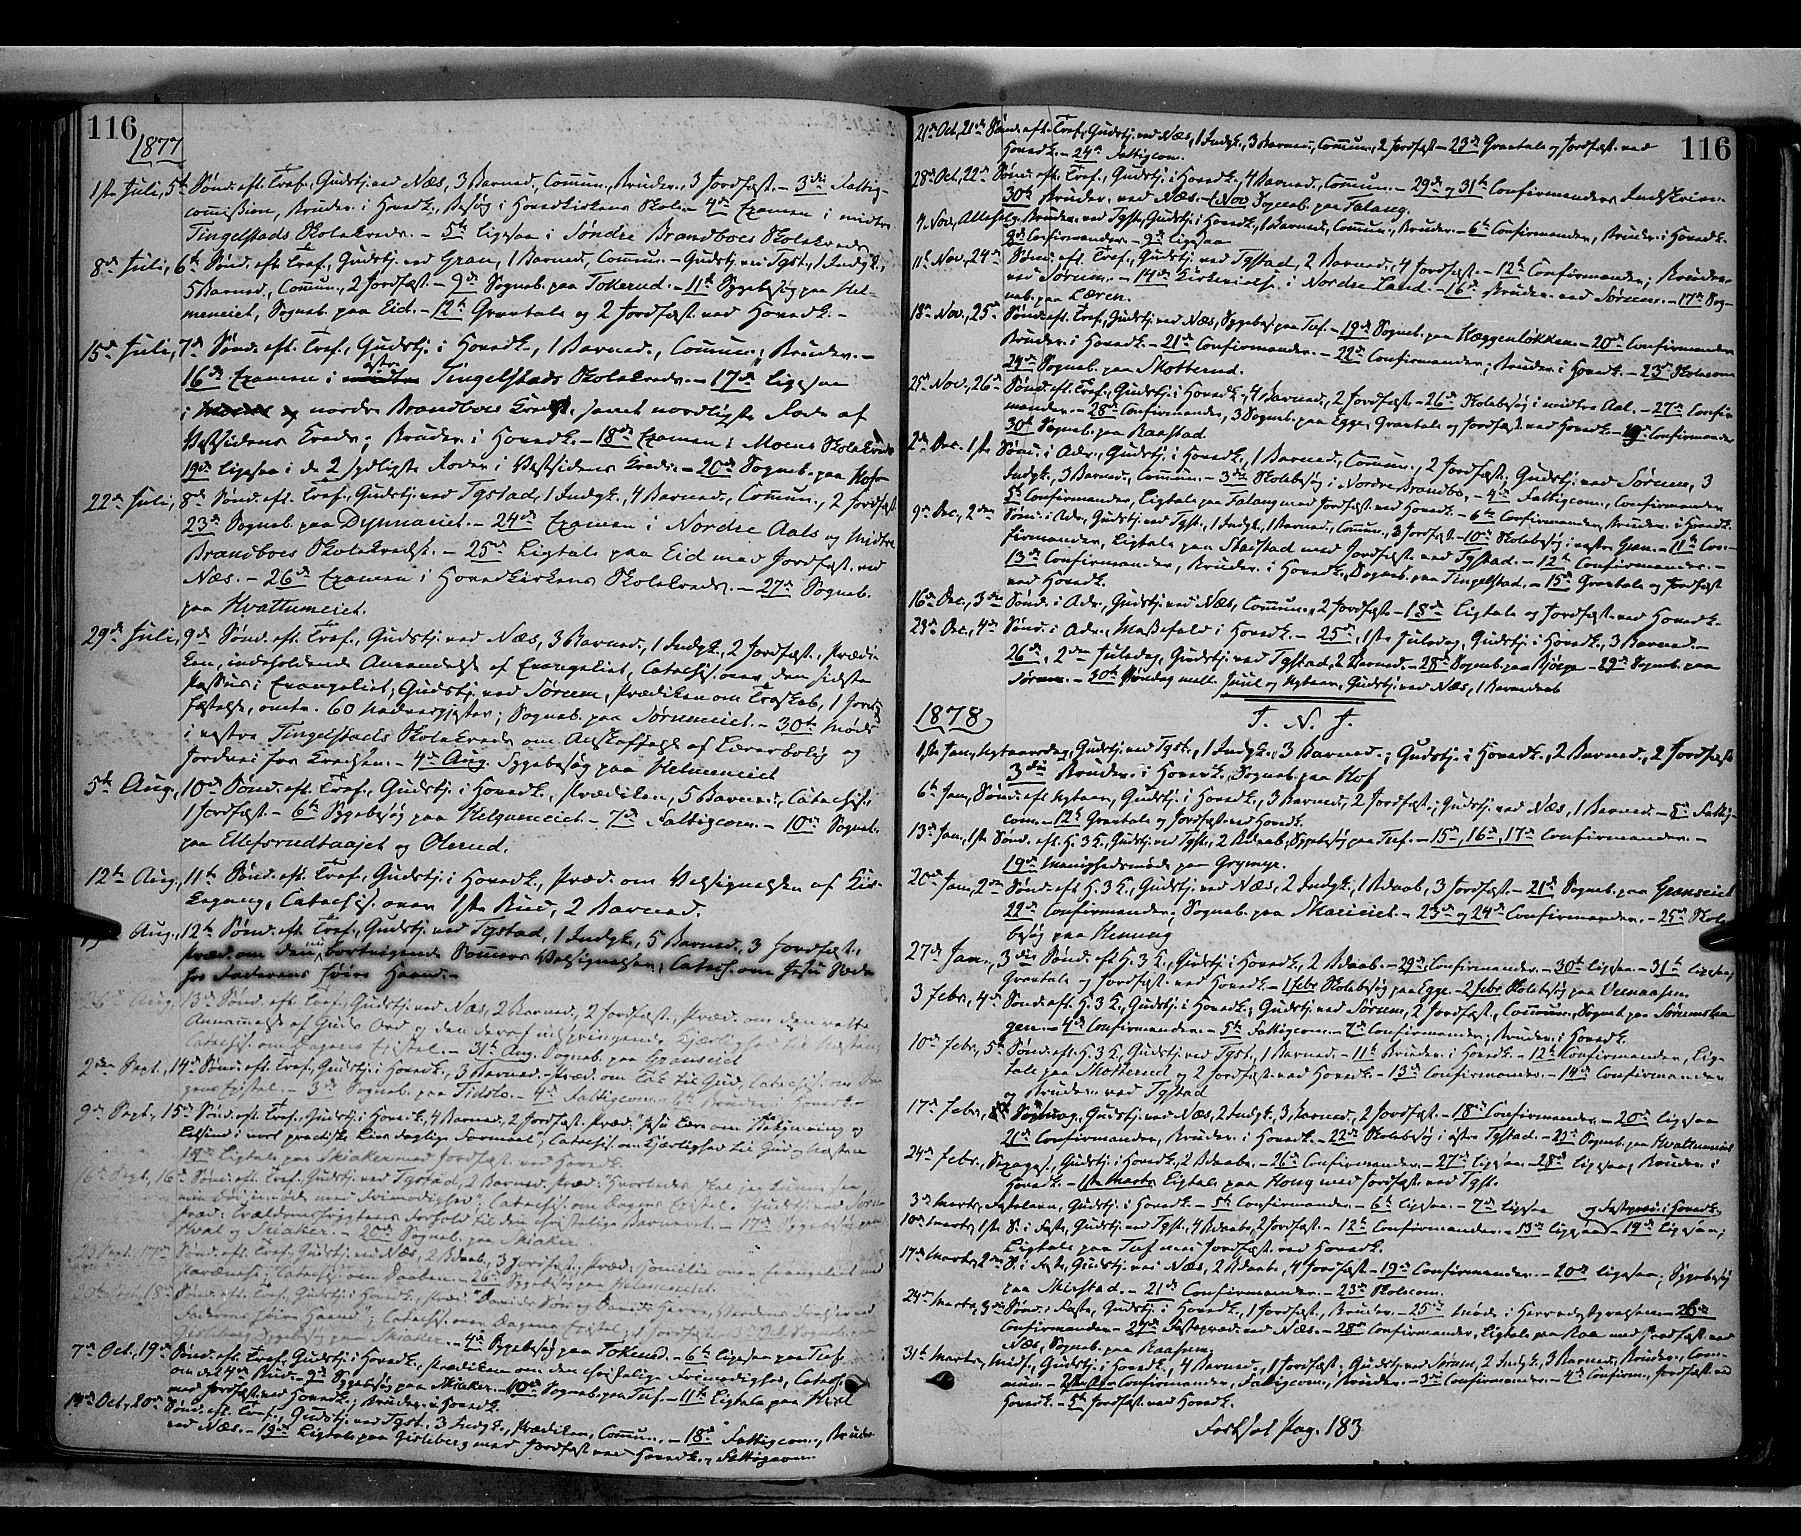 SAH, Gran prestekontor, Ministerialbok nr. 13, 1875-1879, s. 116